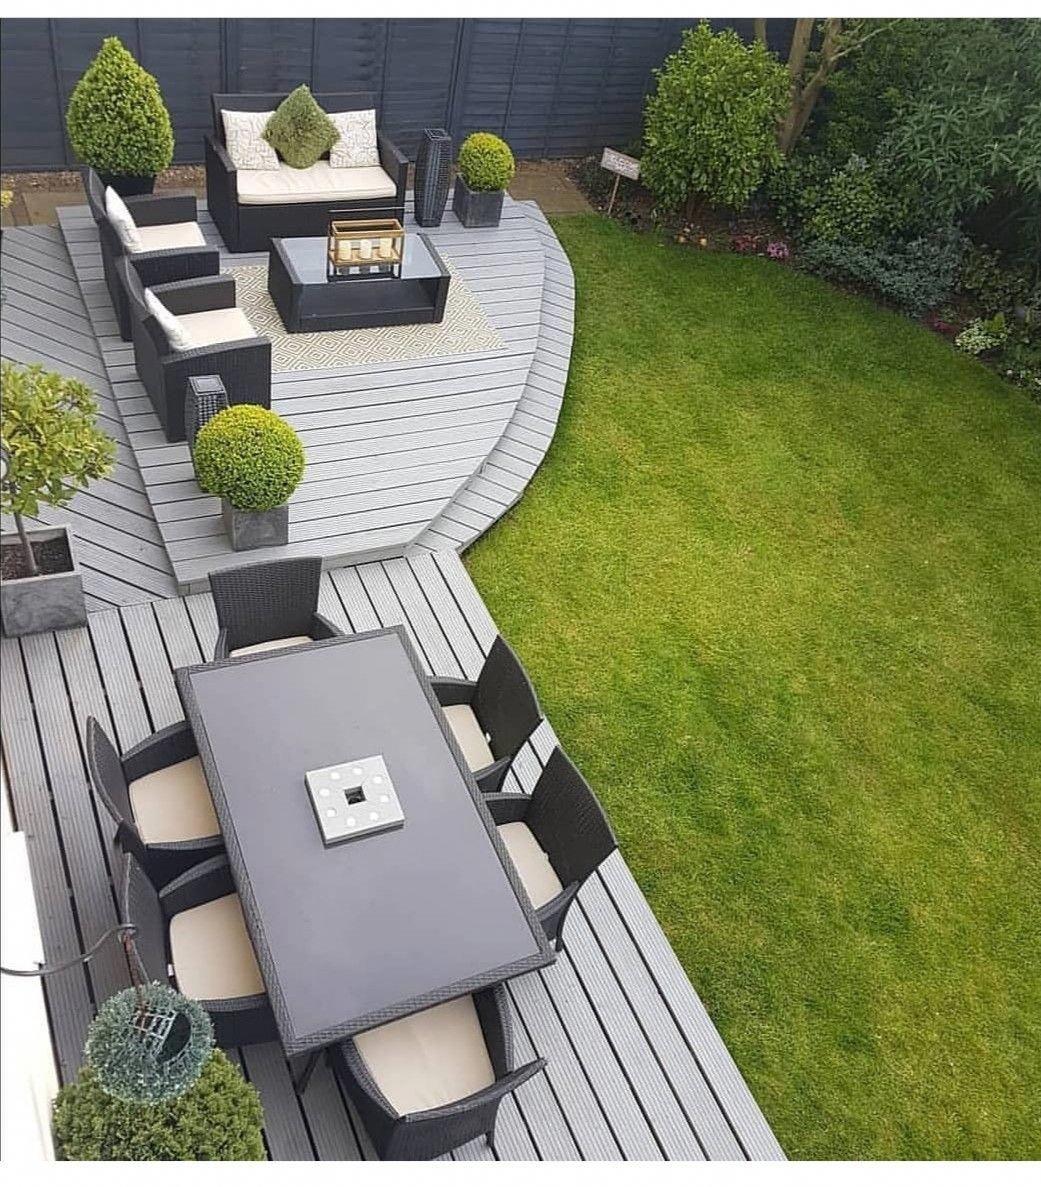 Pin By Dominika Avgi On Small Backyard Landscapes Backyard Landscaping Designs Patio Garden Design Small Backyard Landscaping